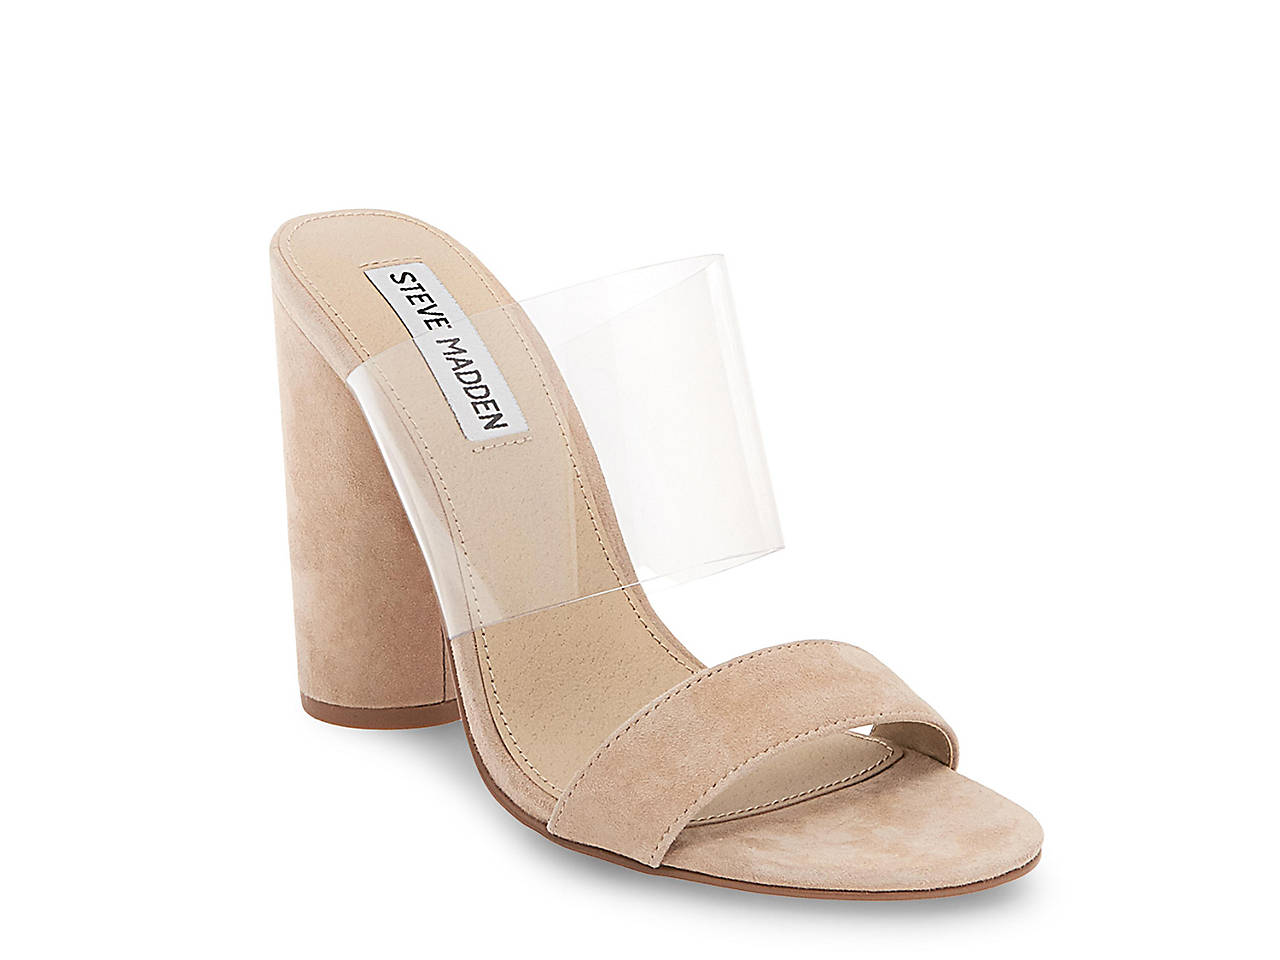 8a7f23baaccf Steve Madden Cheers Sandal Women's Shoes   DSW